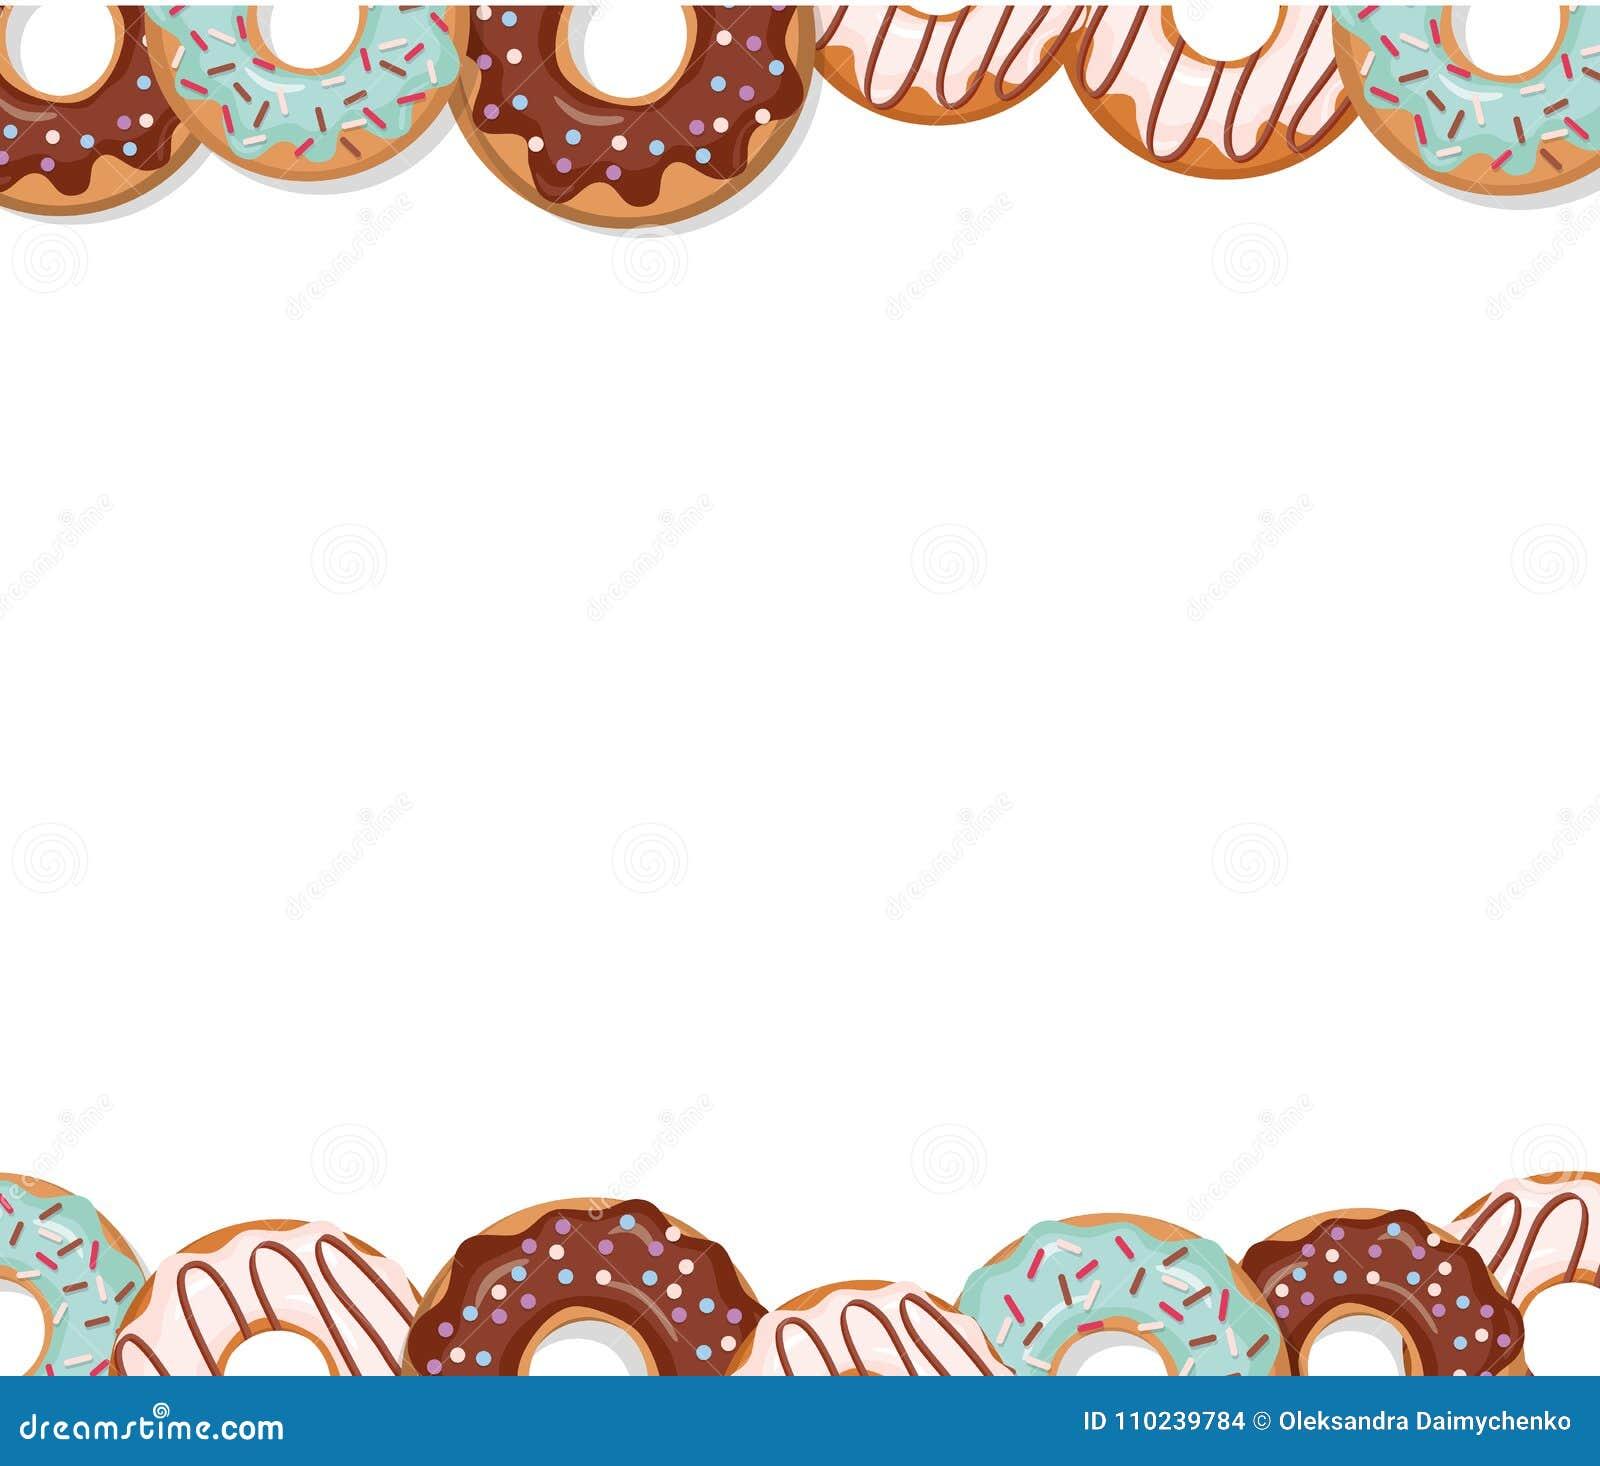 sweet bakery design template cartoon donut borders stock vector